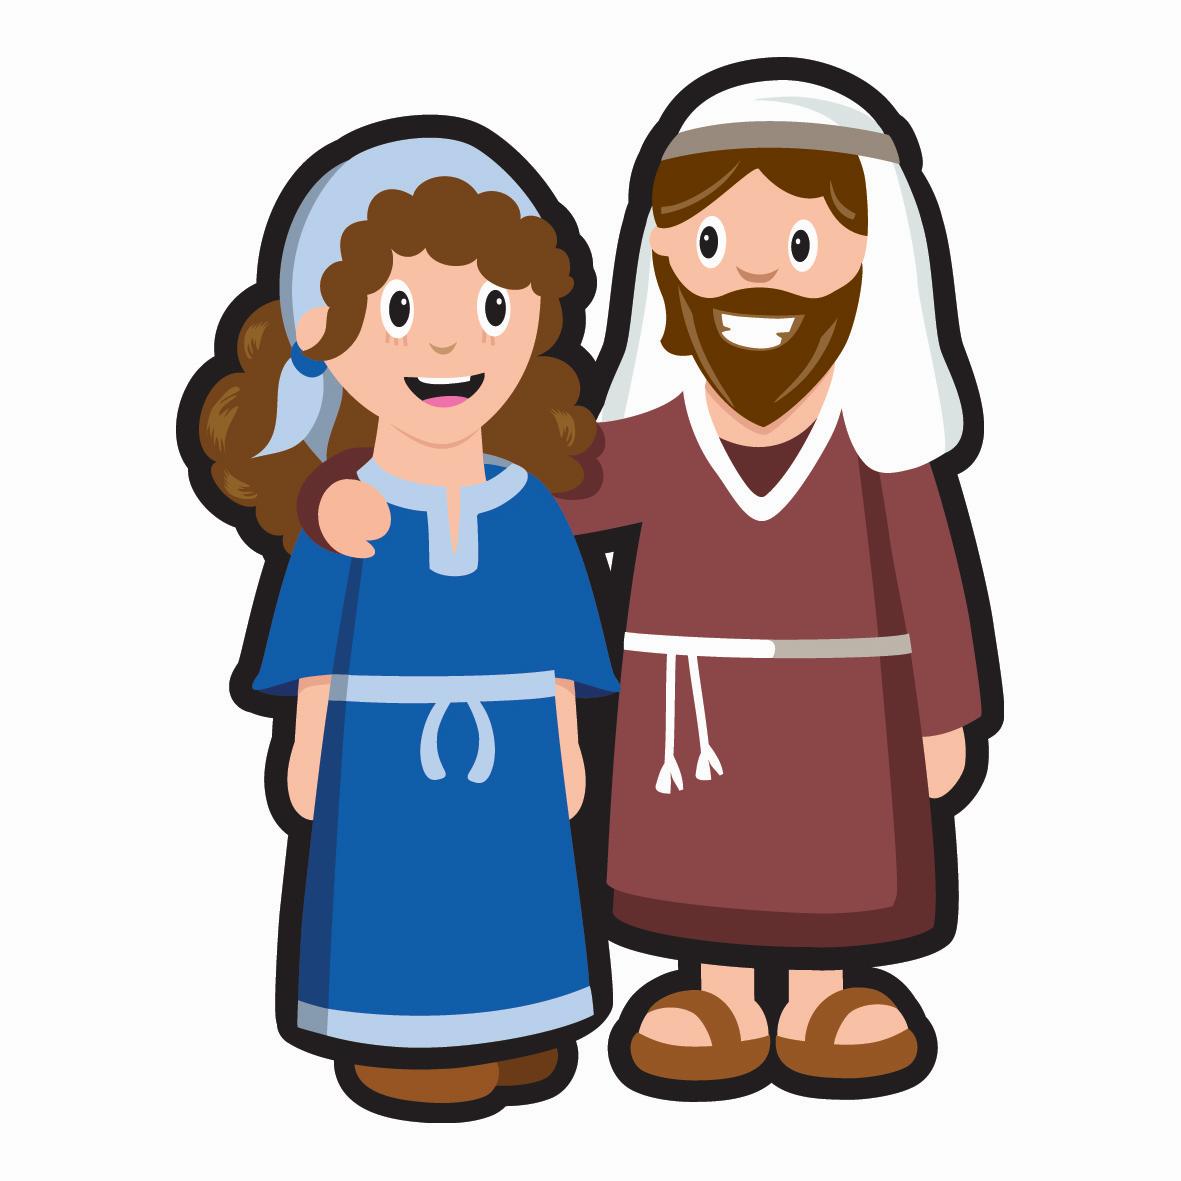 mary joseph lootro rh lootrogames com free clipart mary and joseph mary joseph and baby jesus clipart